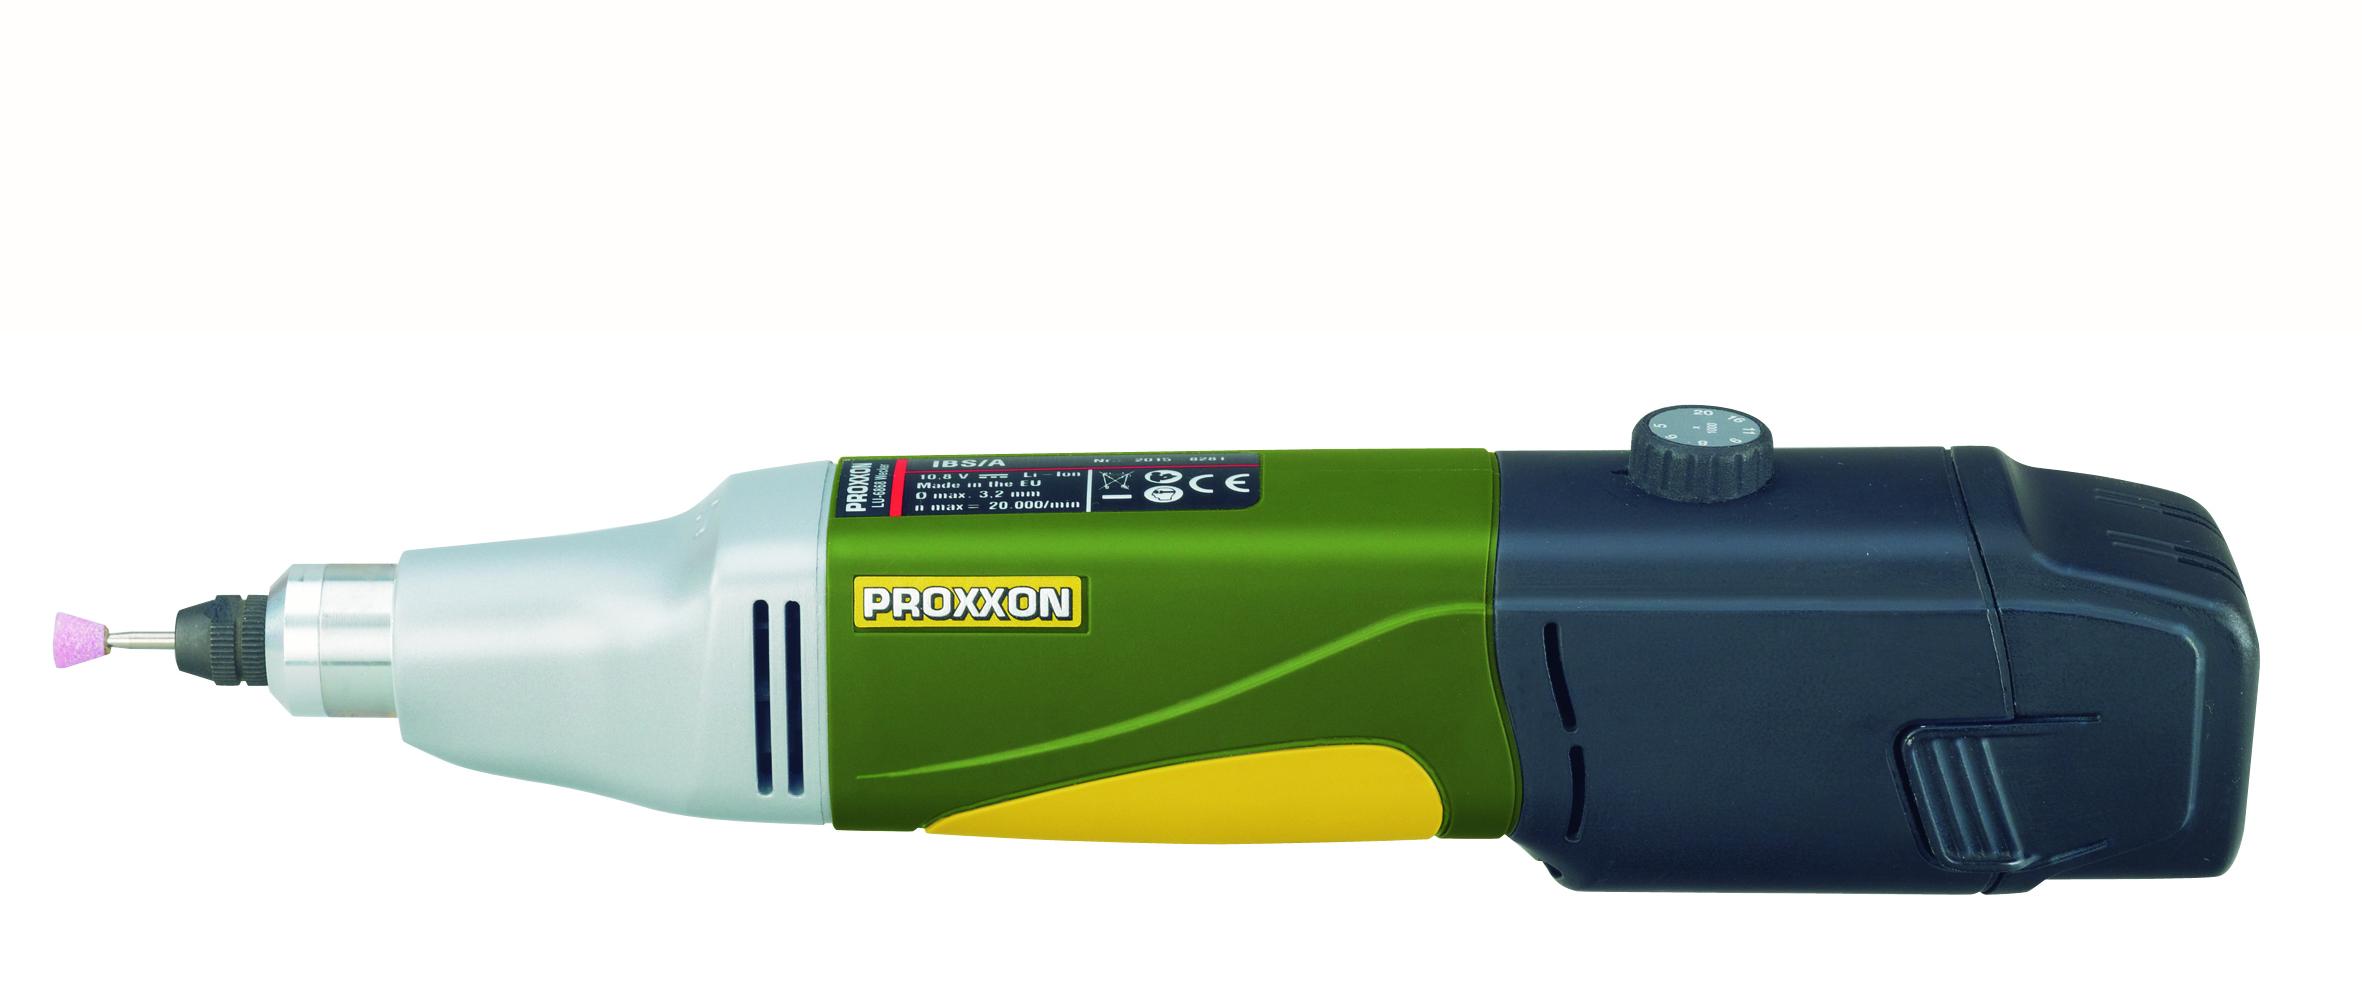 PROXXON 29802 AKU vrtačka IBS/A (no baterie)